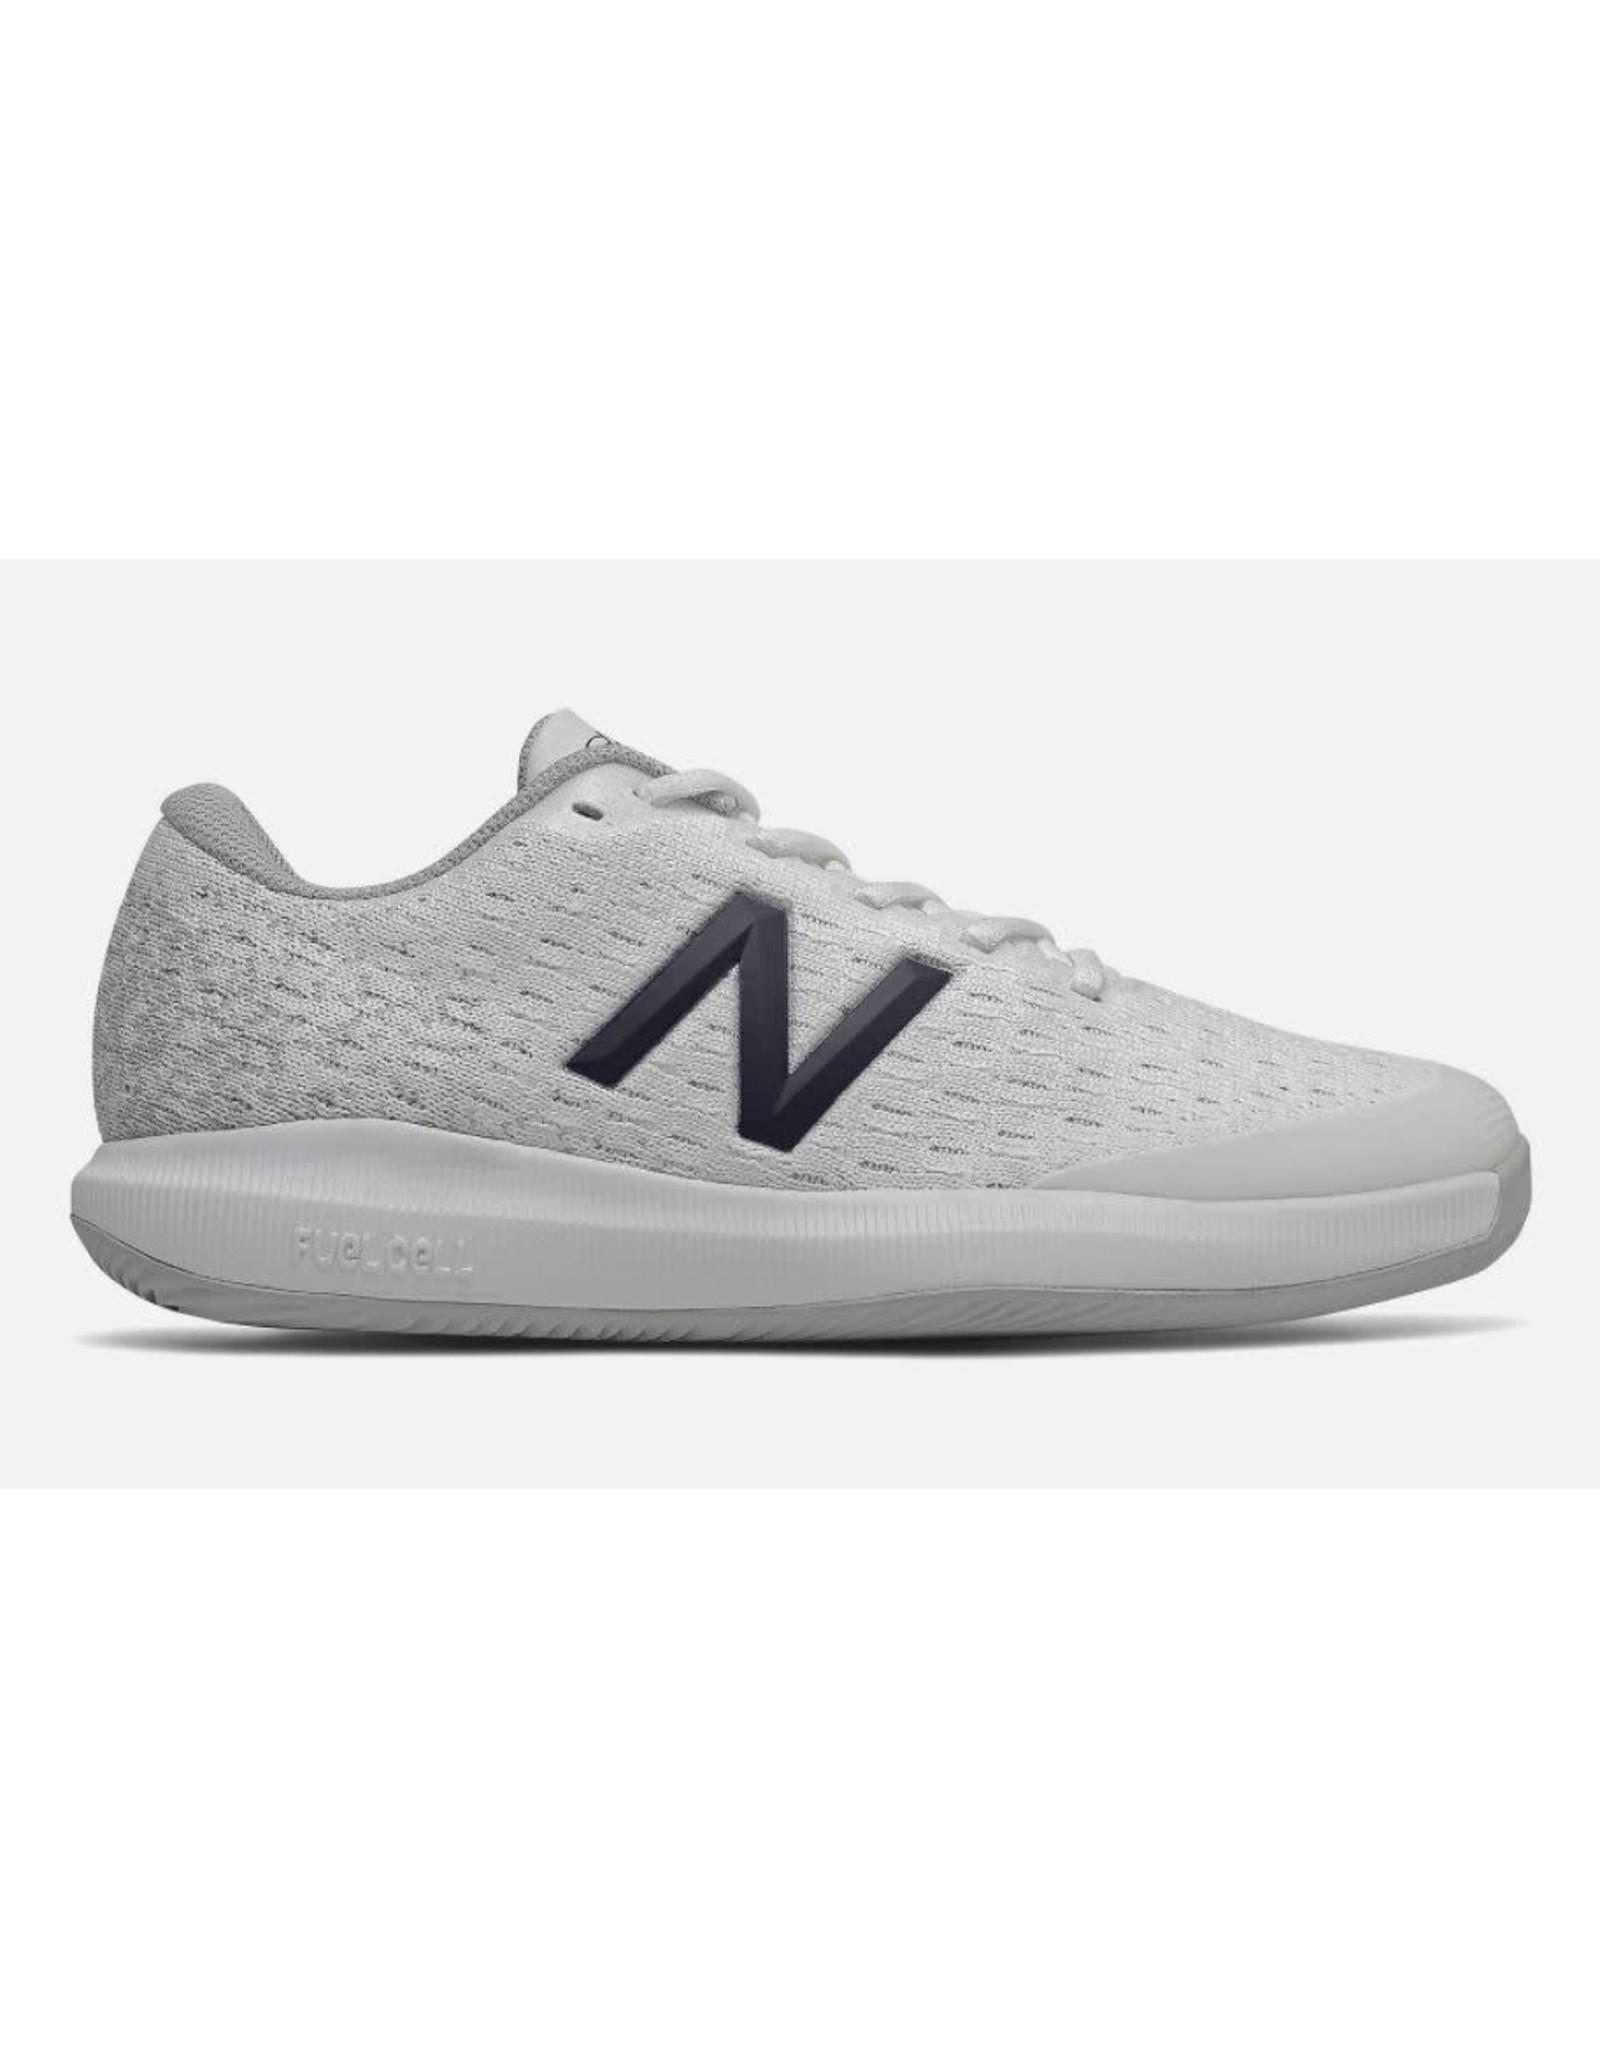 New Balance New Balance WCH996W4